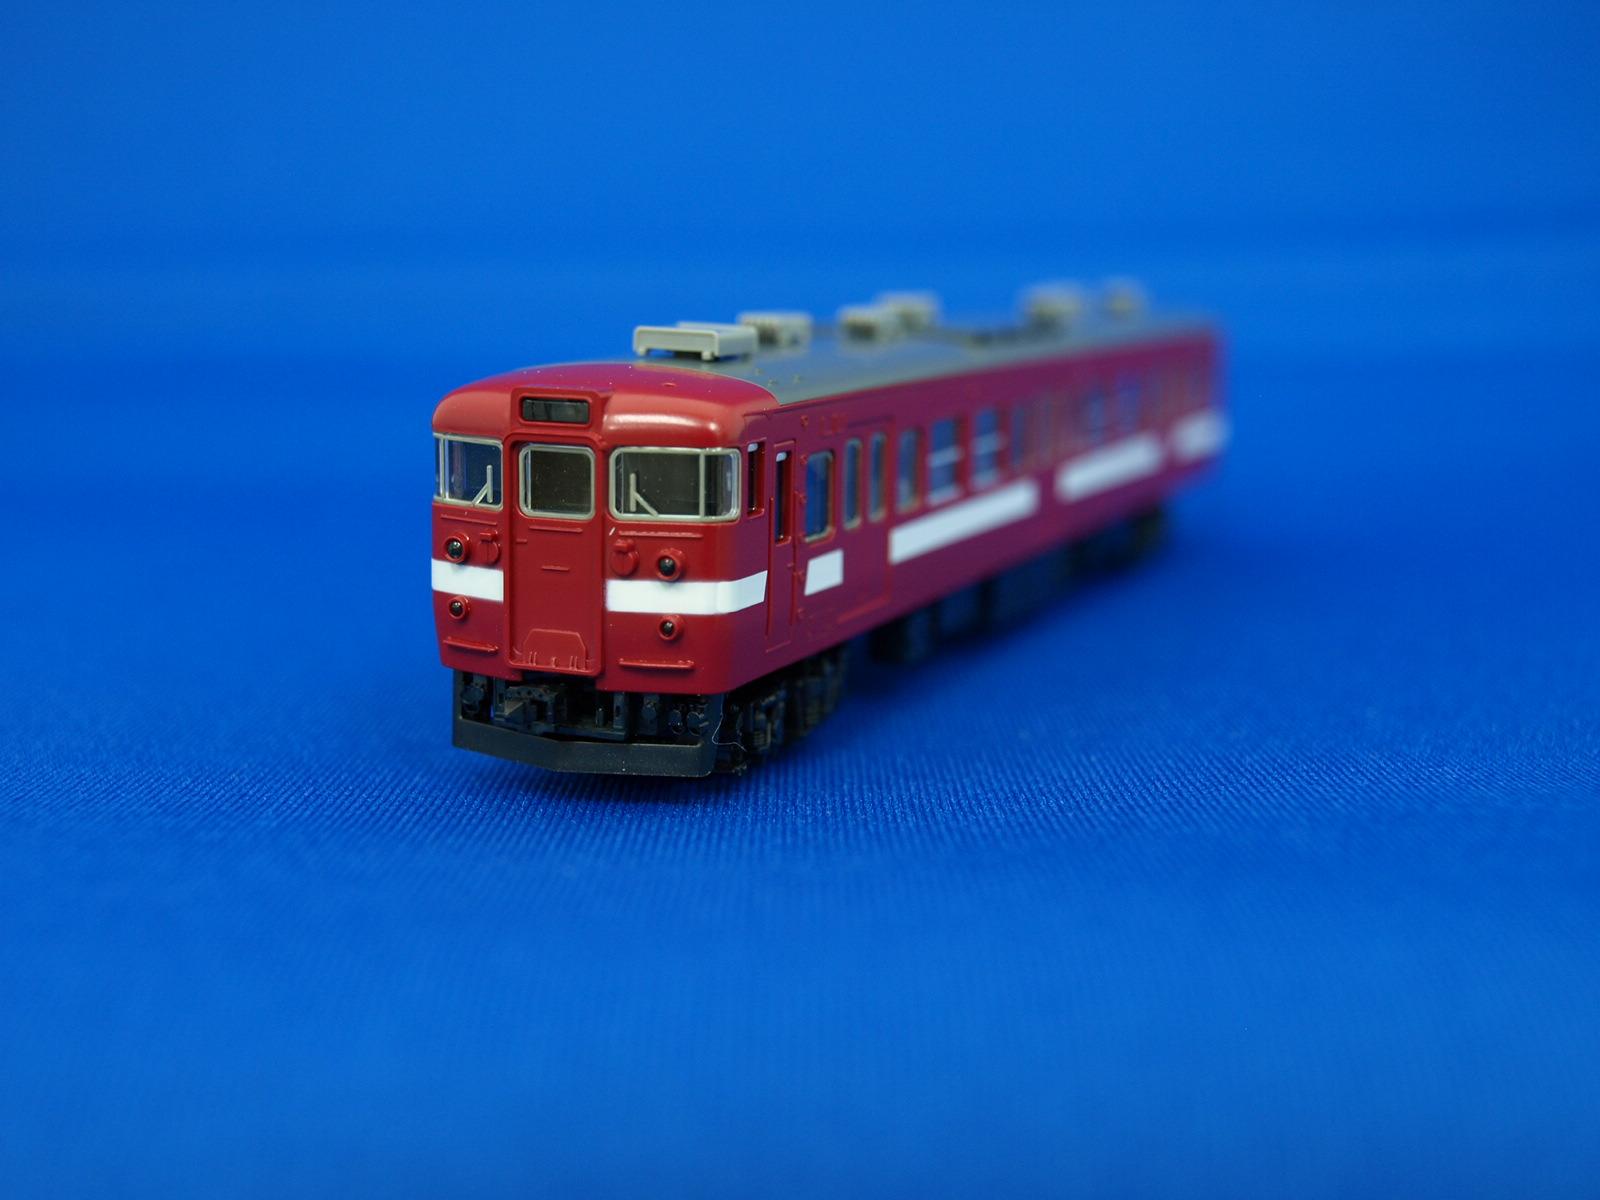 Nゲージ トミックス  98931 「限定品」 国鉄 115-2000系近郊電車(身延線)4両セット